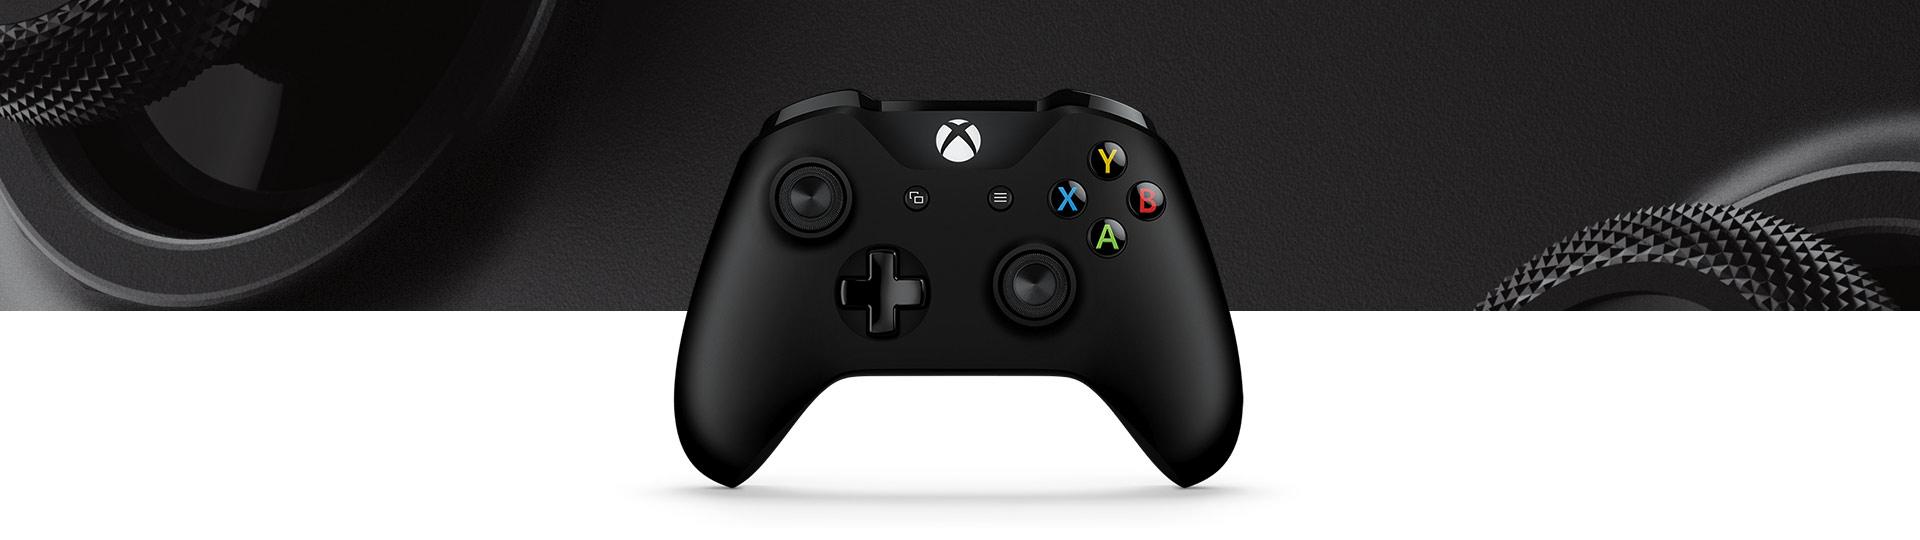 medium resolution of xbox wireless controller black